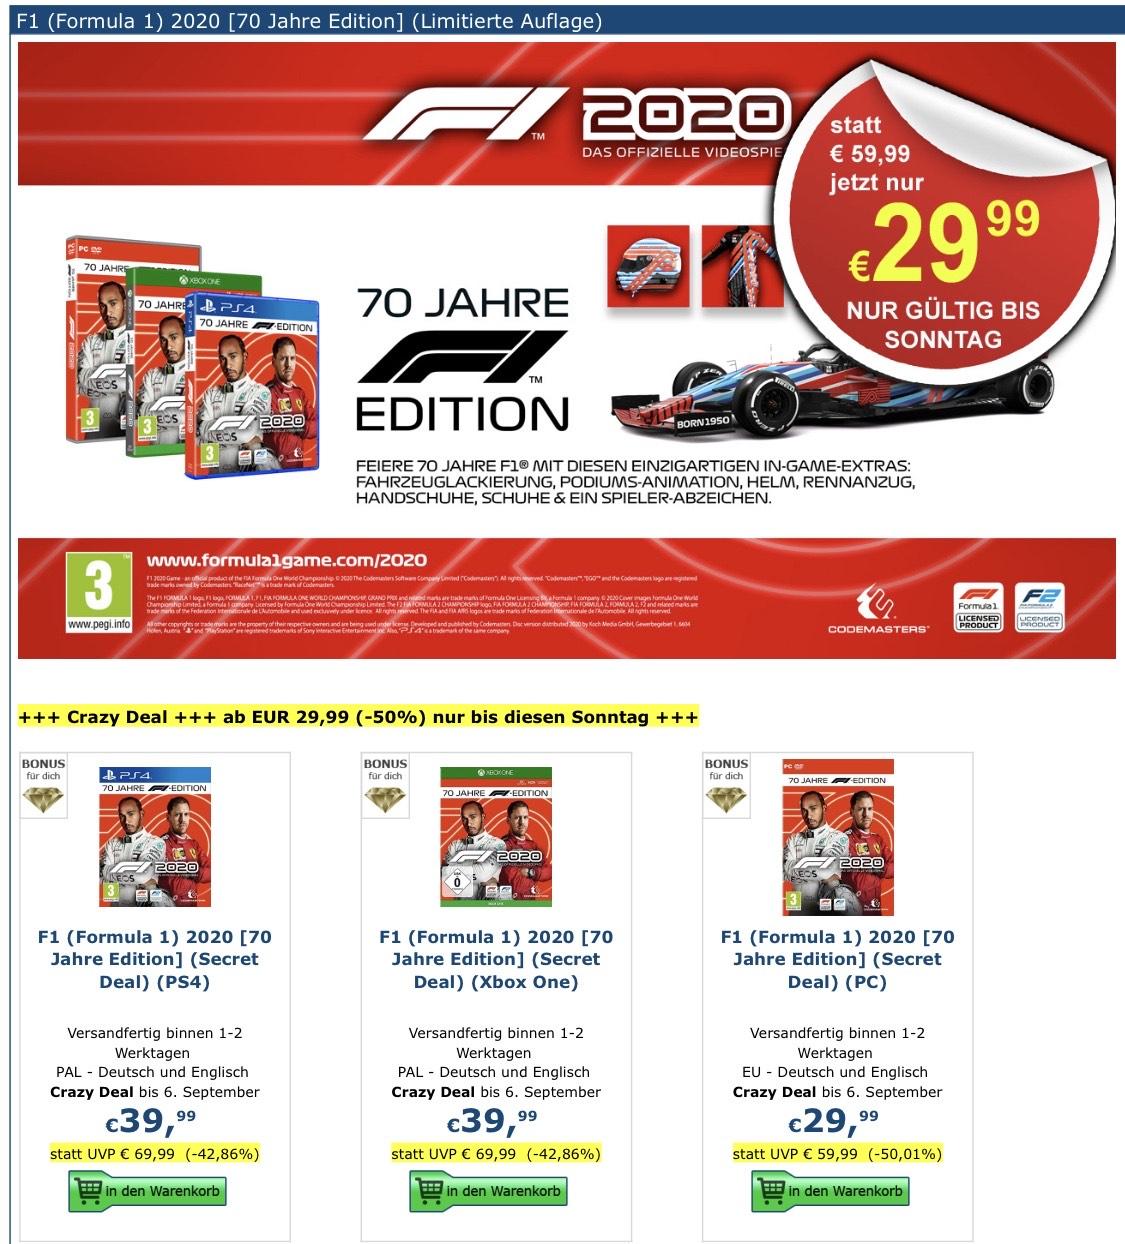 F1 2020 - 70 Jahre Edition (PlayStation 4 / Xbox One)